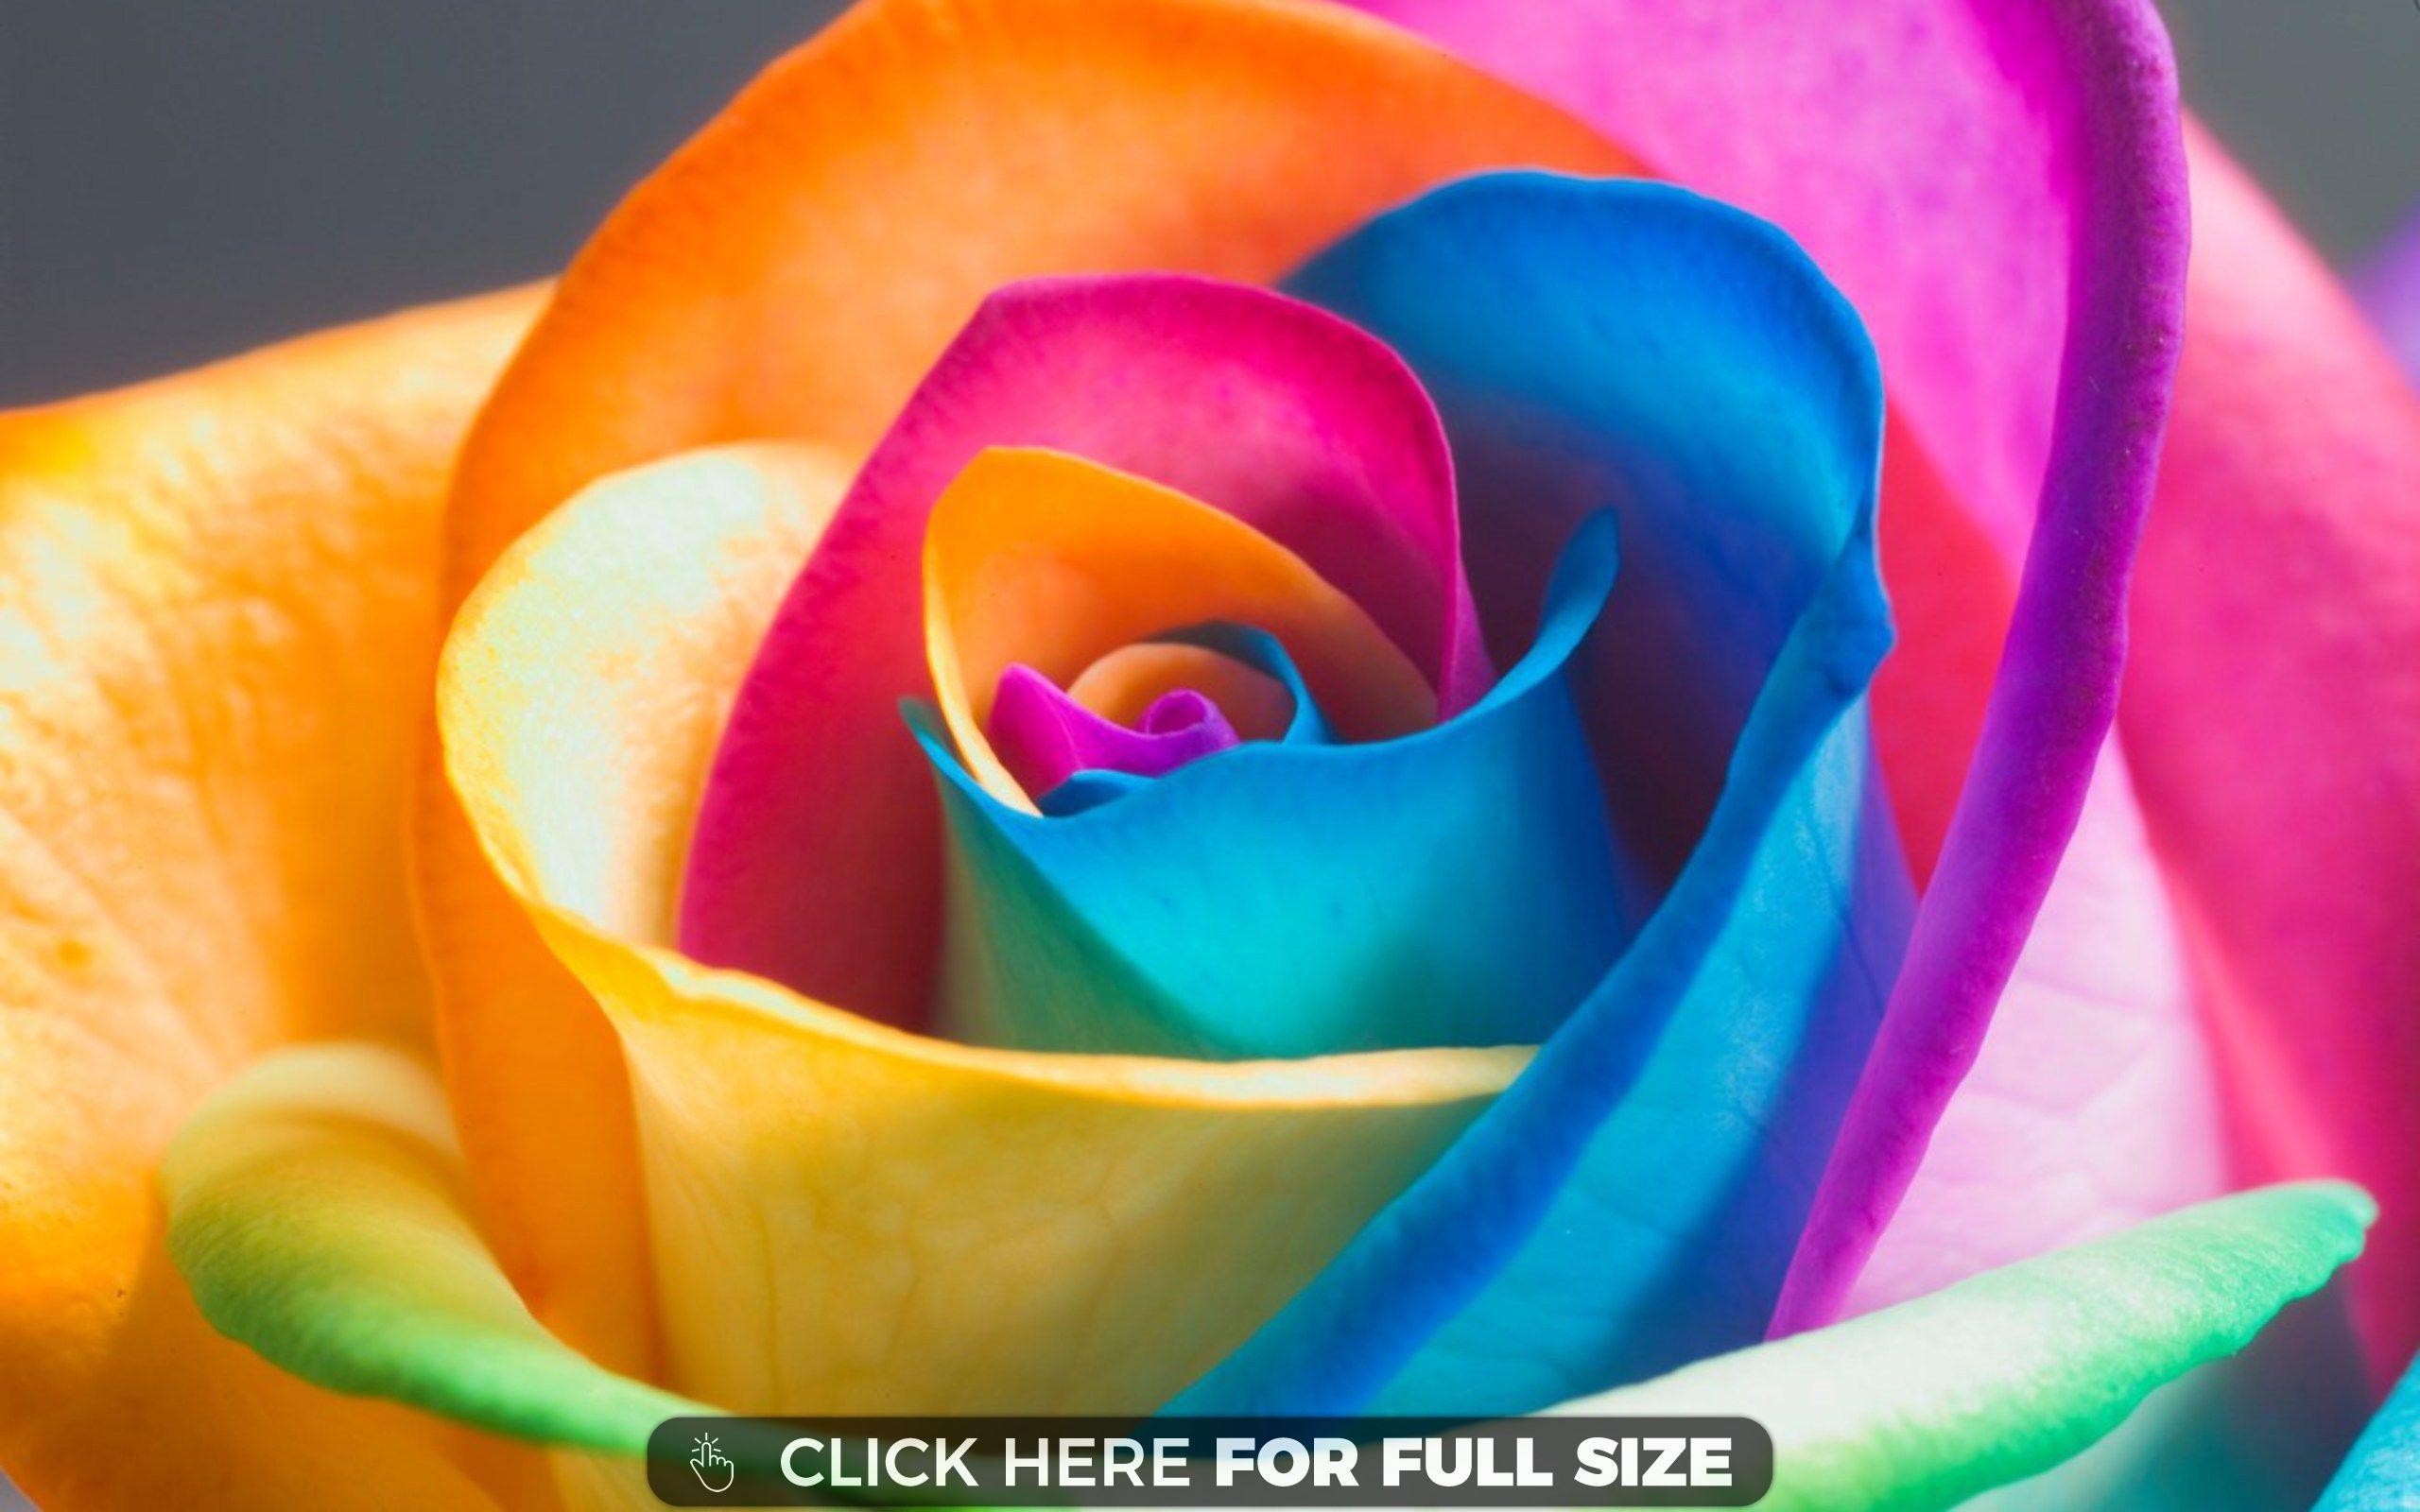 srainbow rose 3d flowers full hd   desktop wallpapers   pinterest